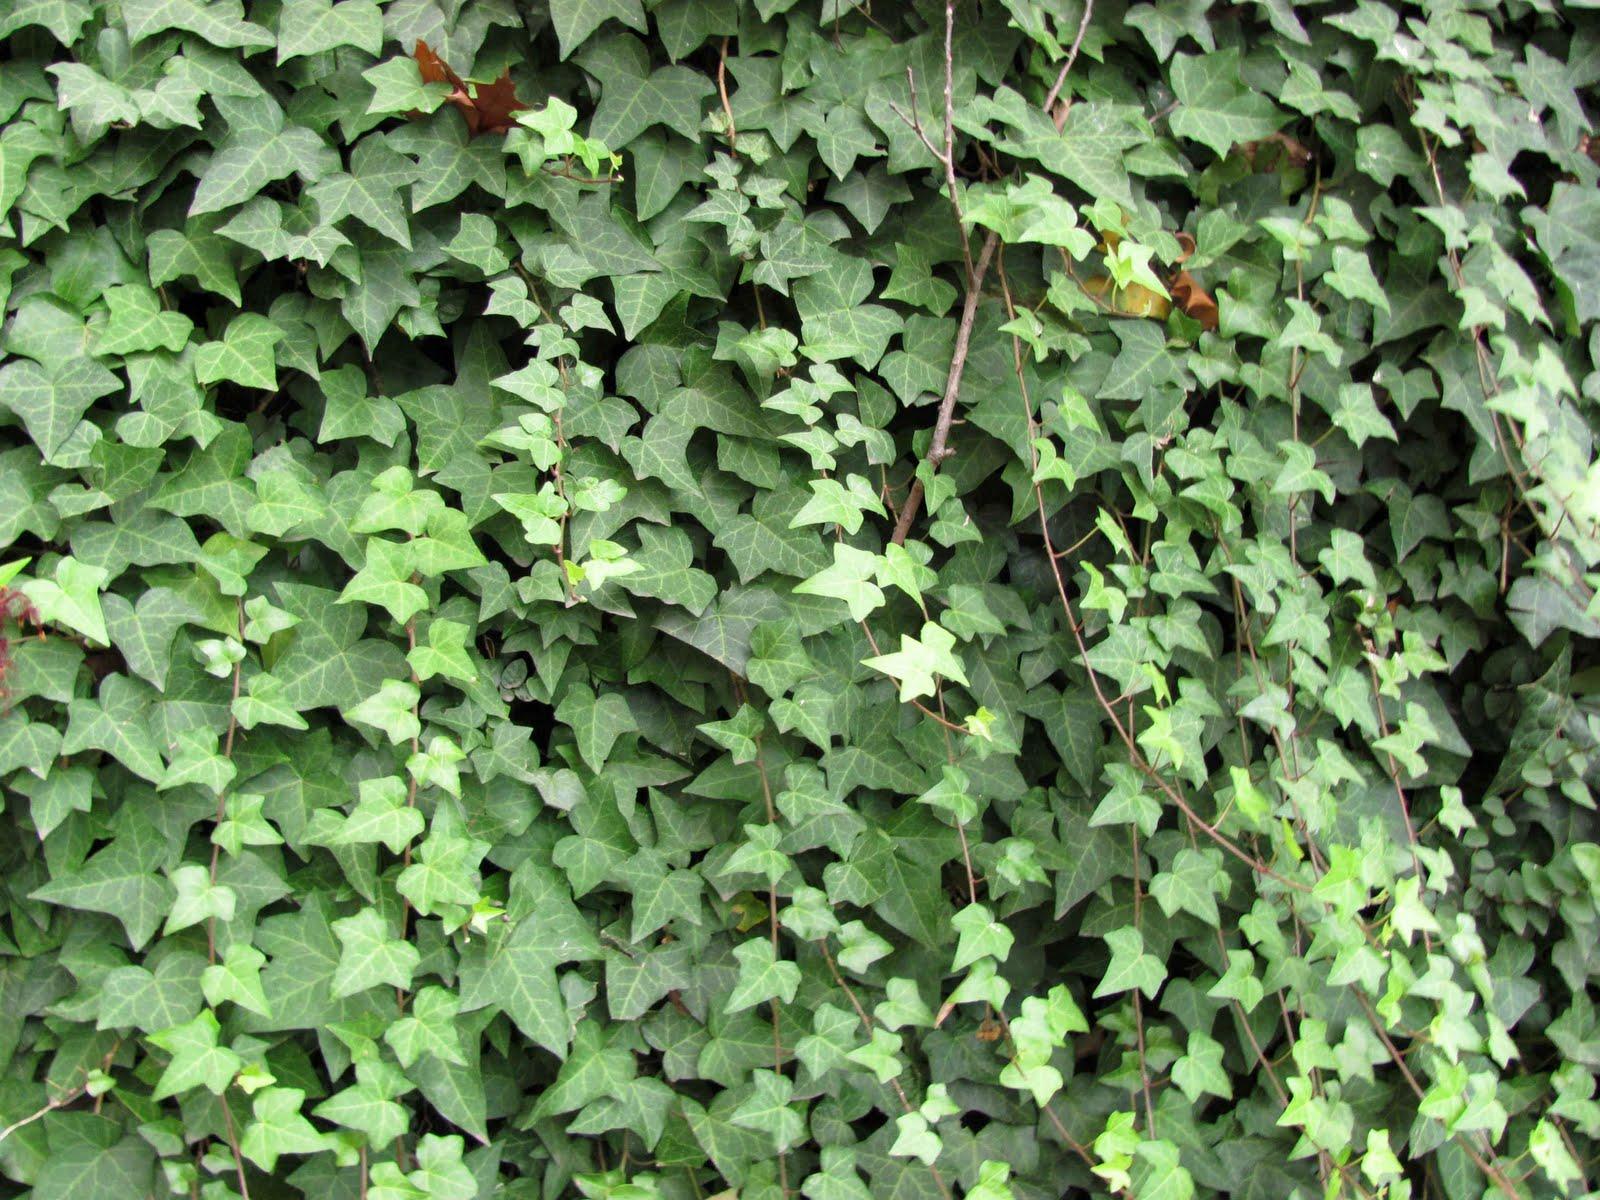 Enamorada del muro vivero arg ello for Plantas trepadoras para muros